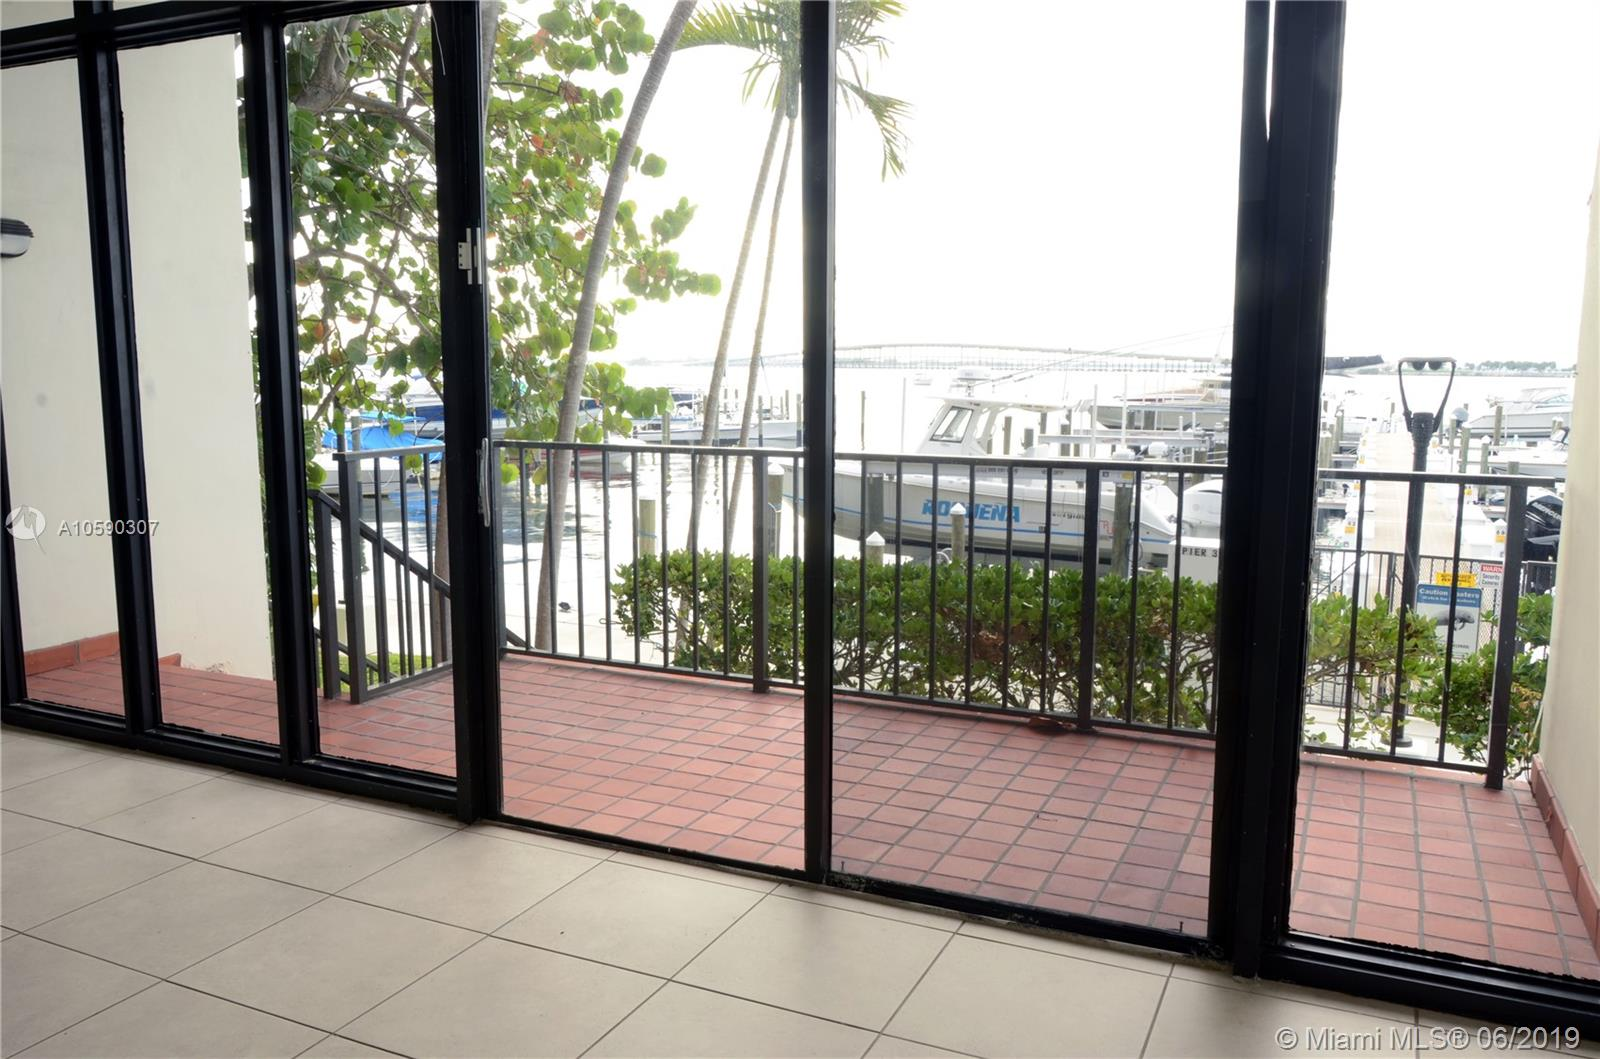 Brickell Place I image #8